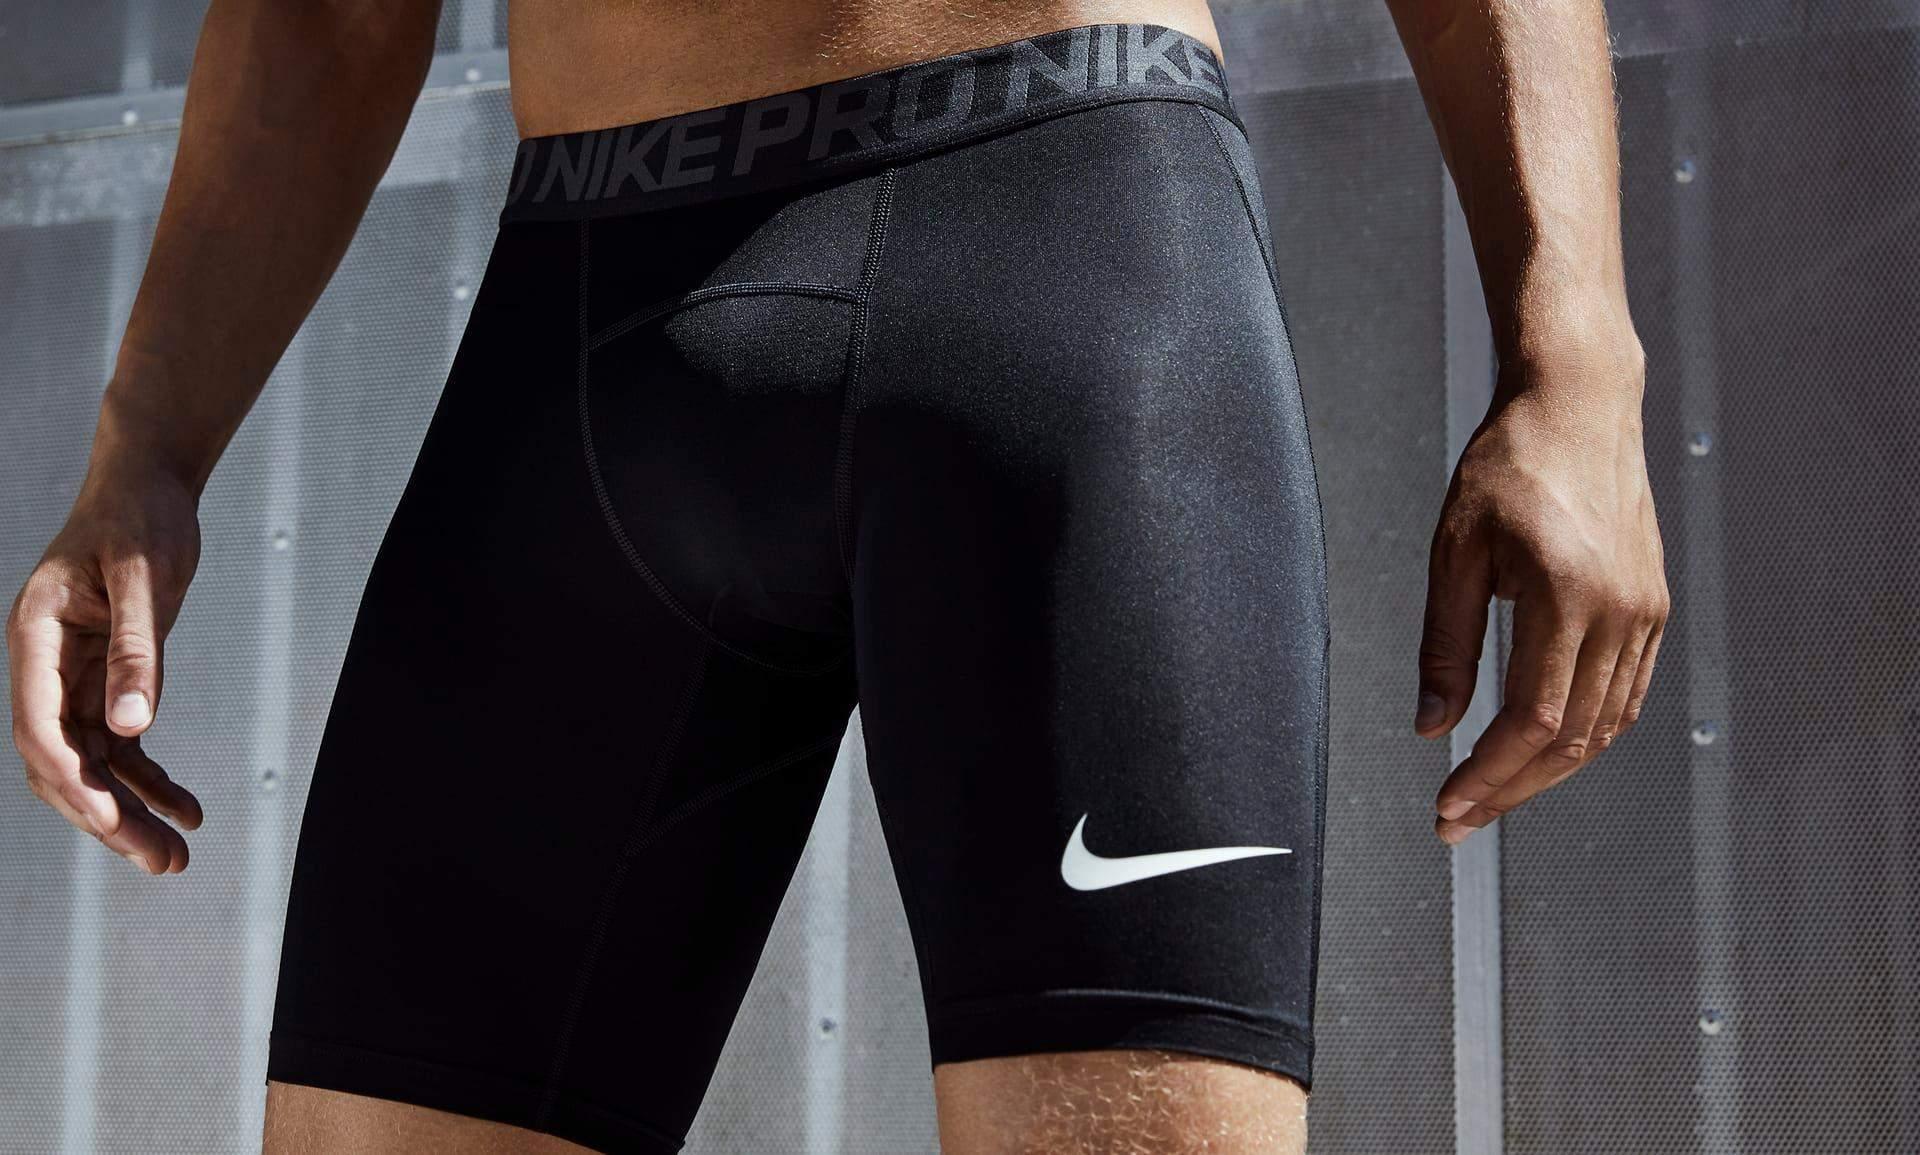 Enge Unterhose Männer? (Unterwäsche, Männermode)